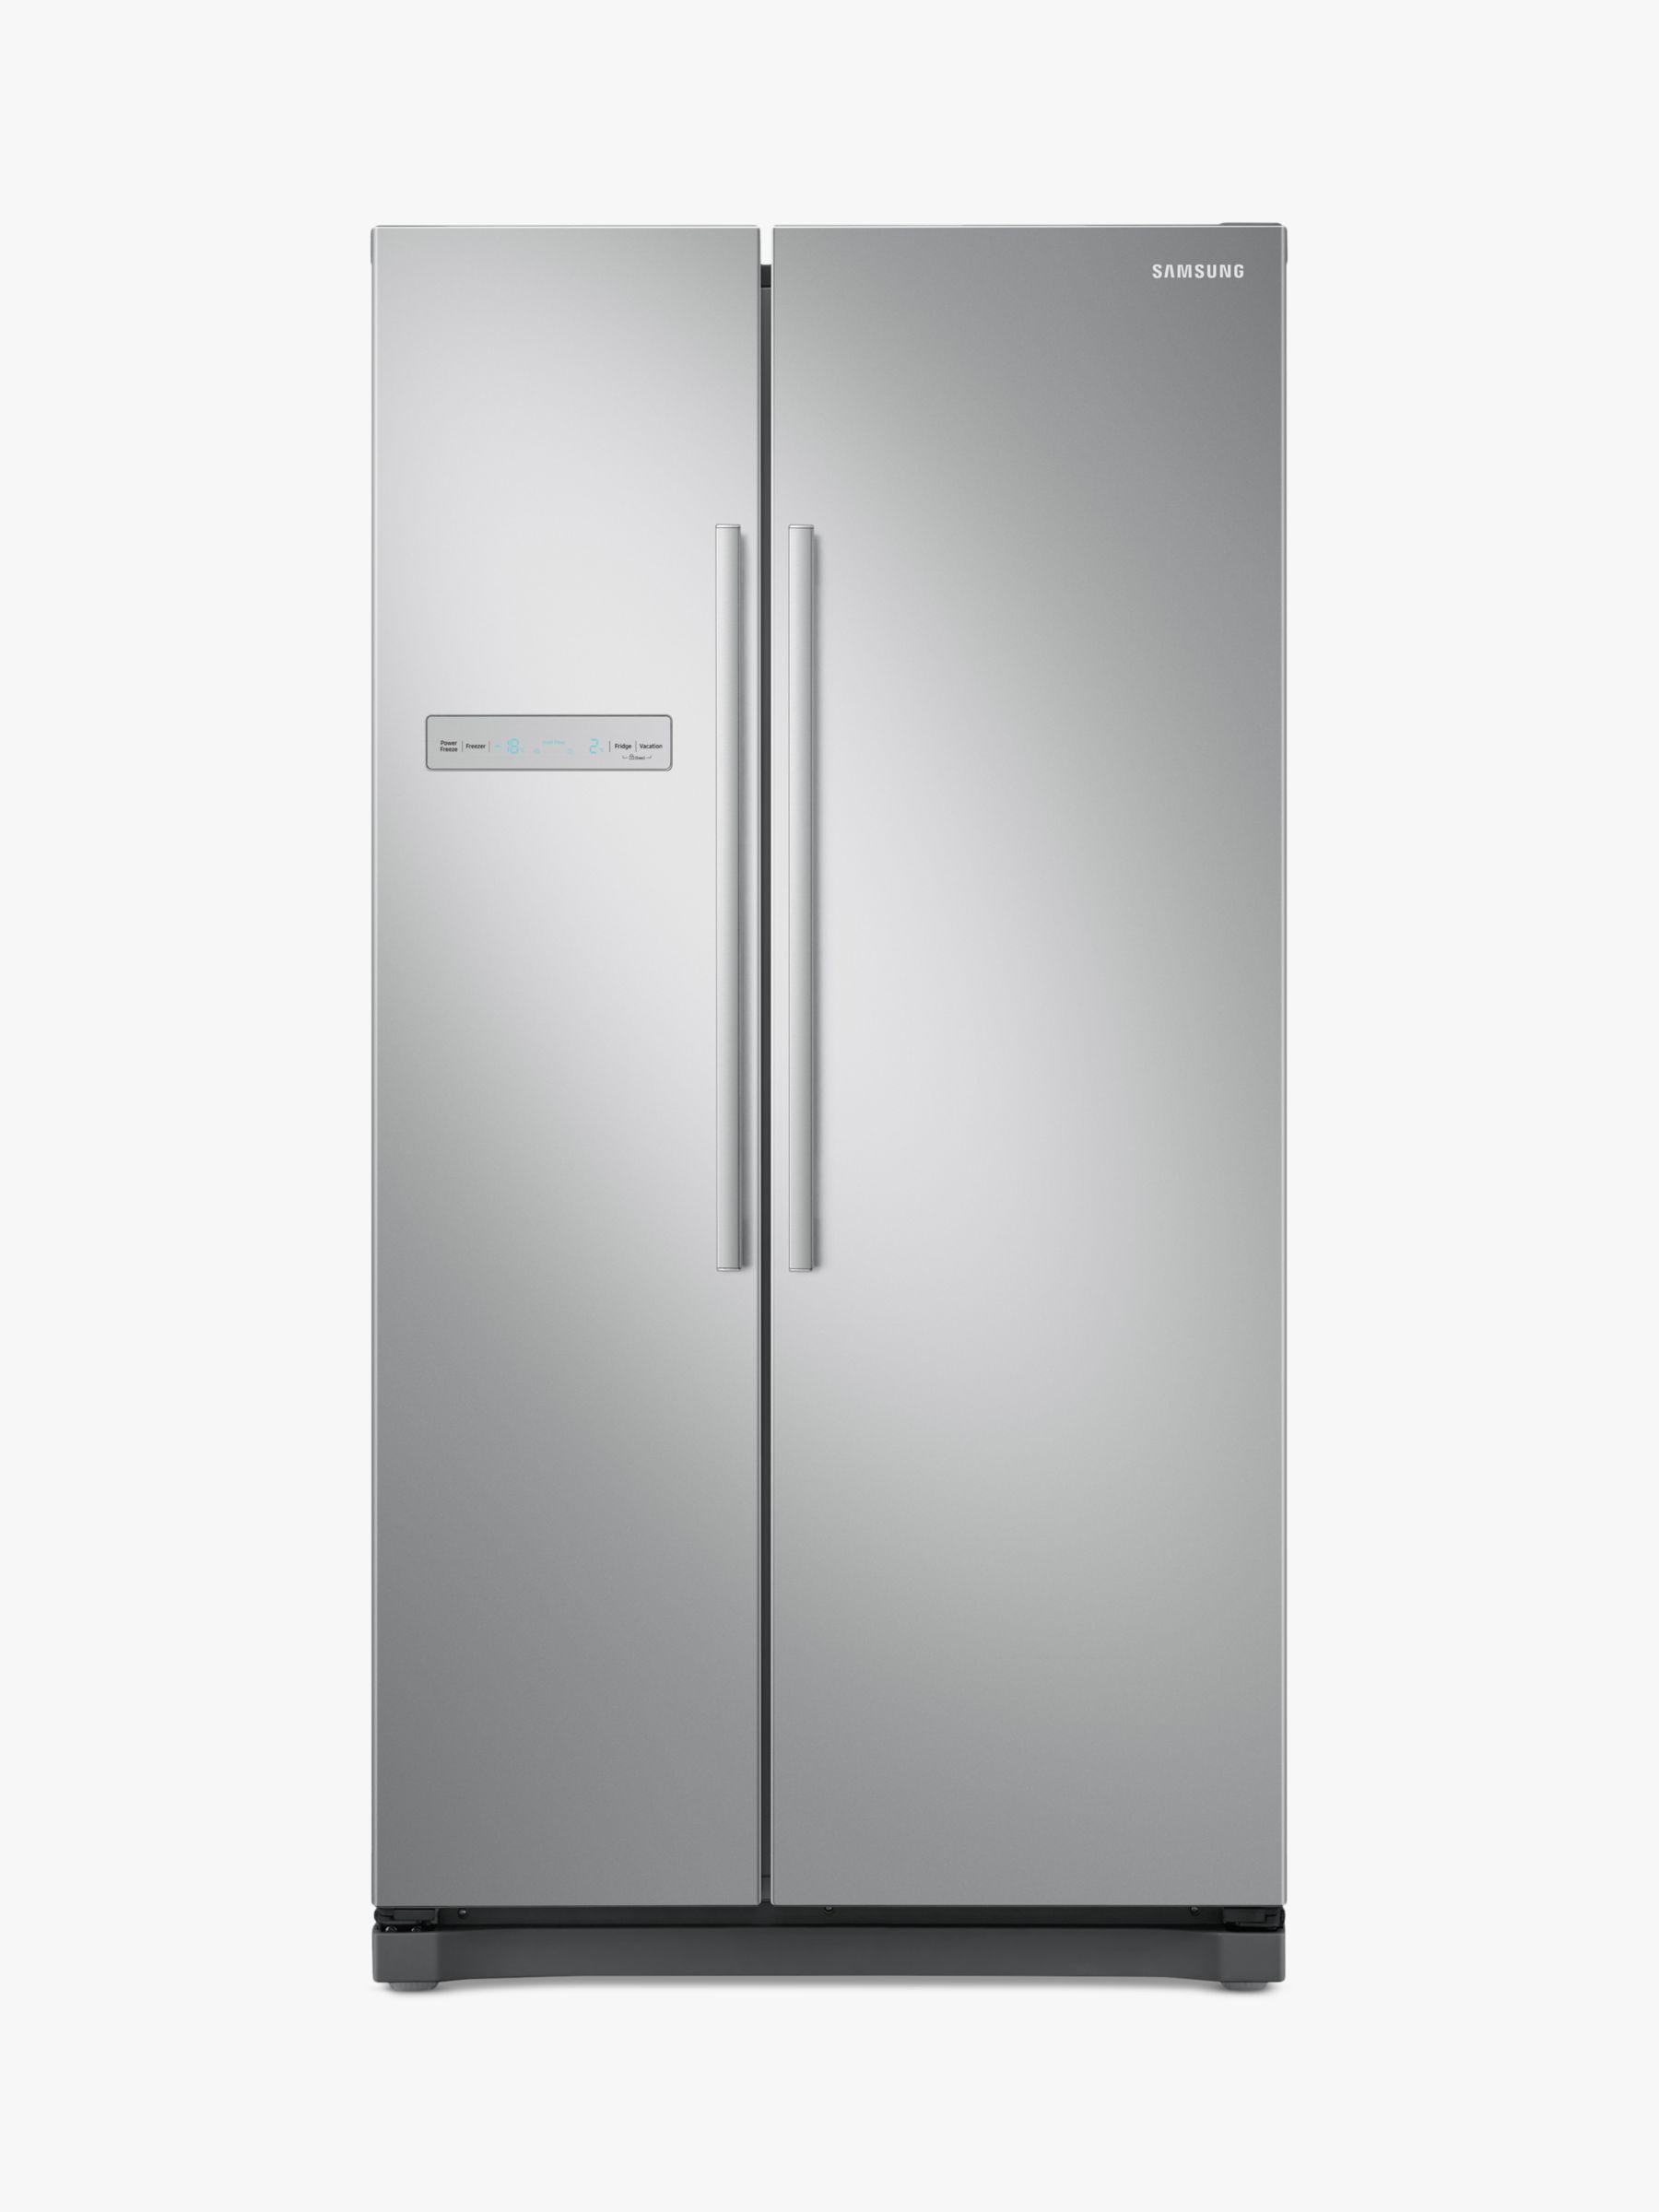 Samsung Samsung RS54N3103SA Freestanding American Style Fridge Freezer, A+ Energy Rating, 91cm Wide, Silver